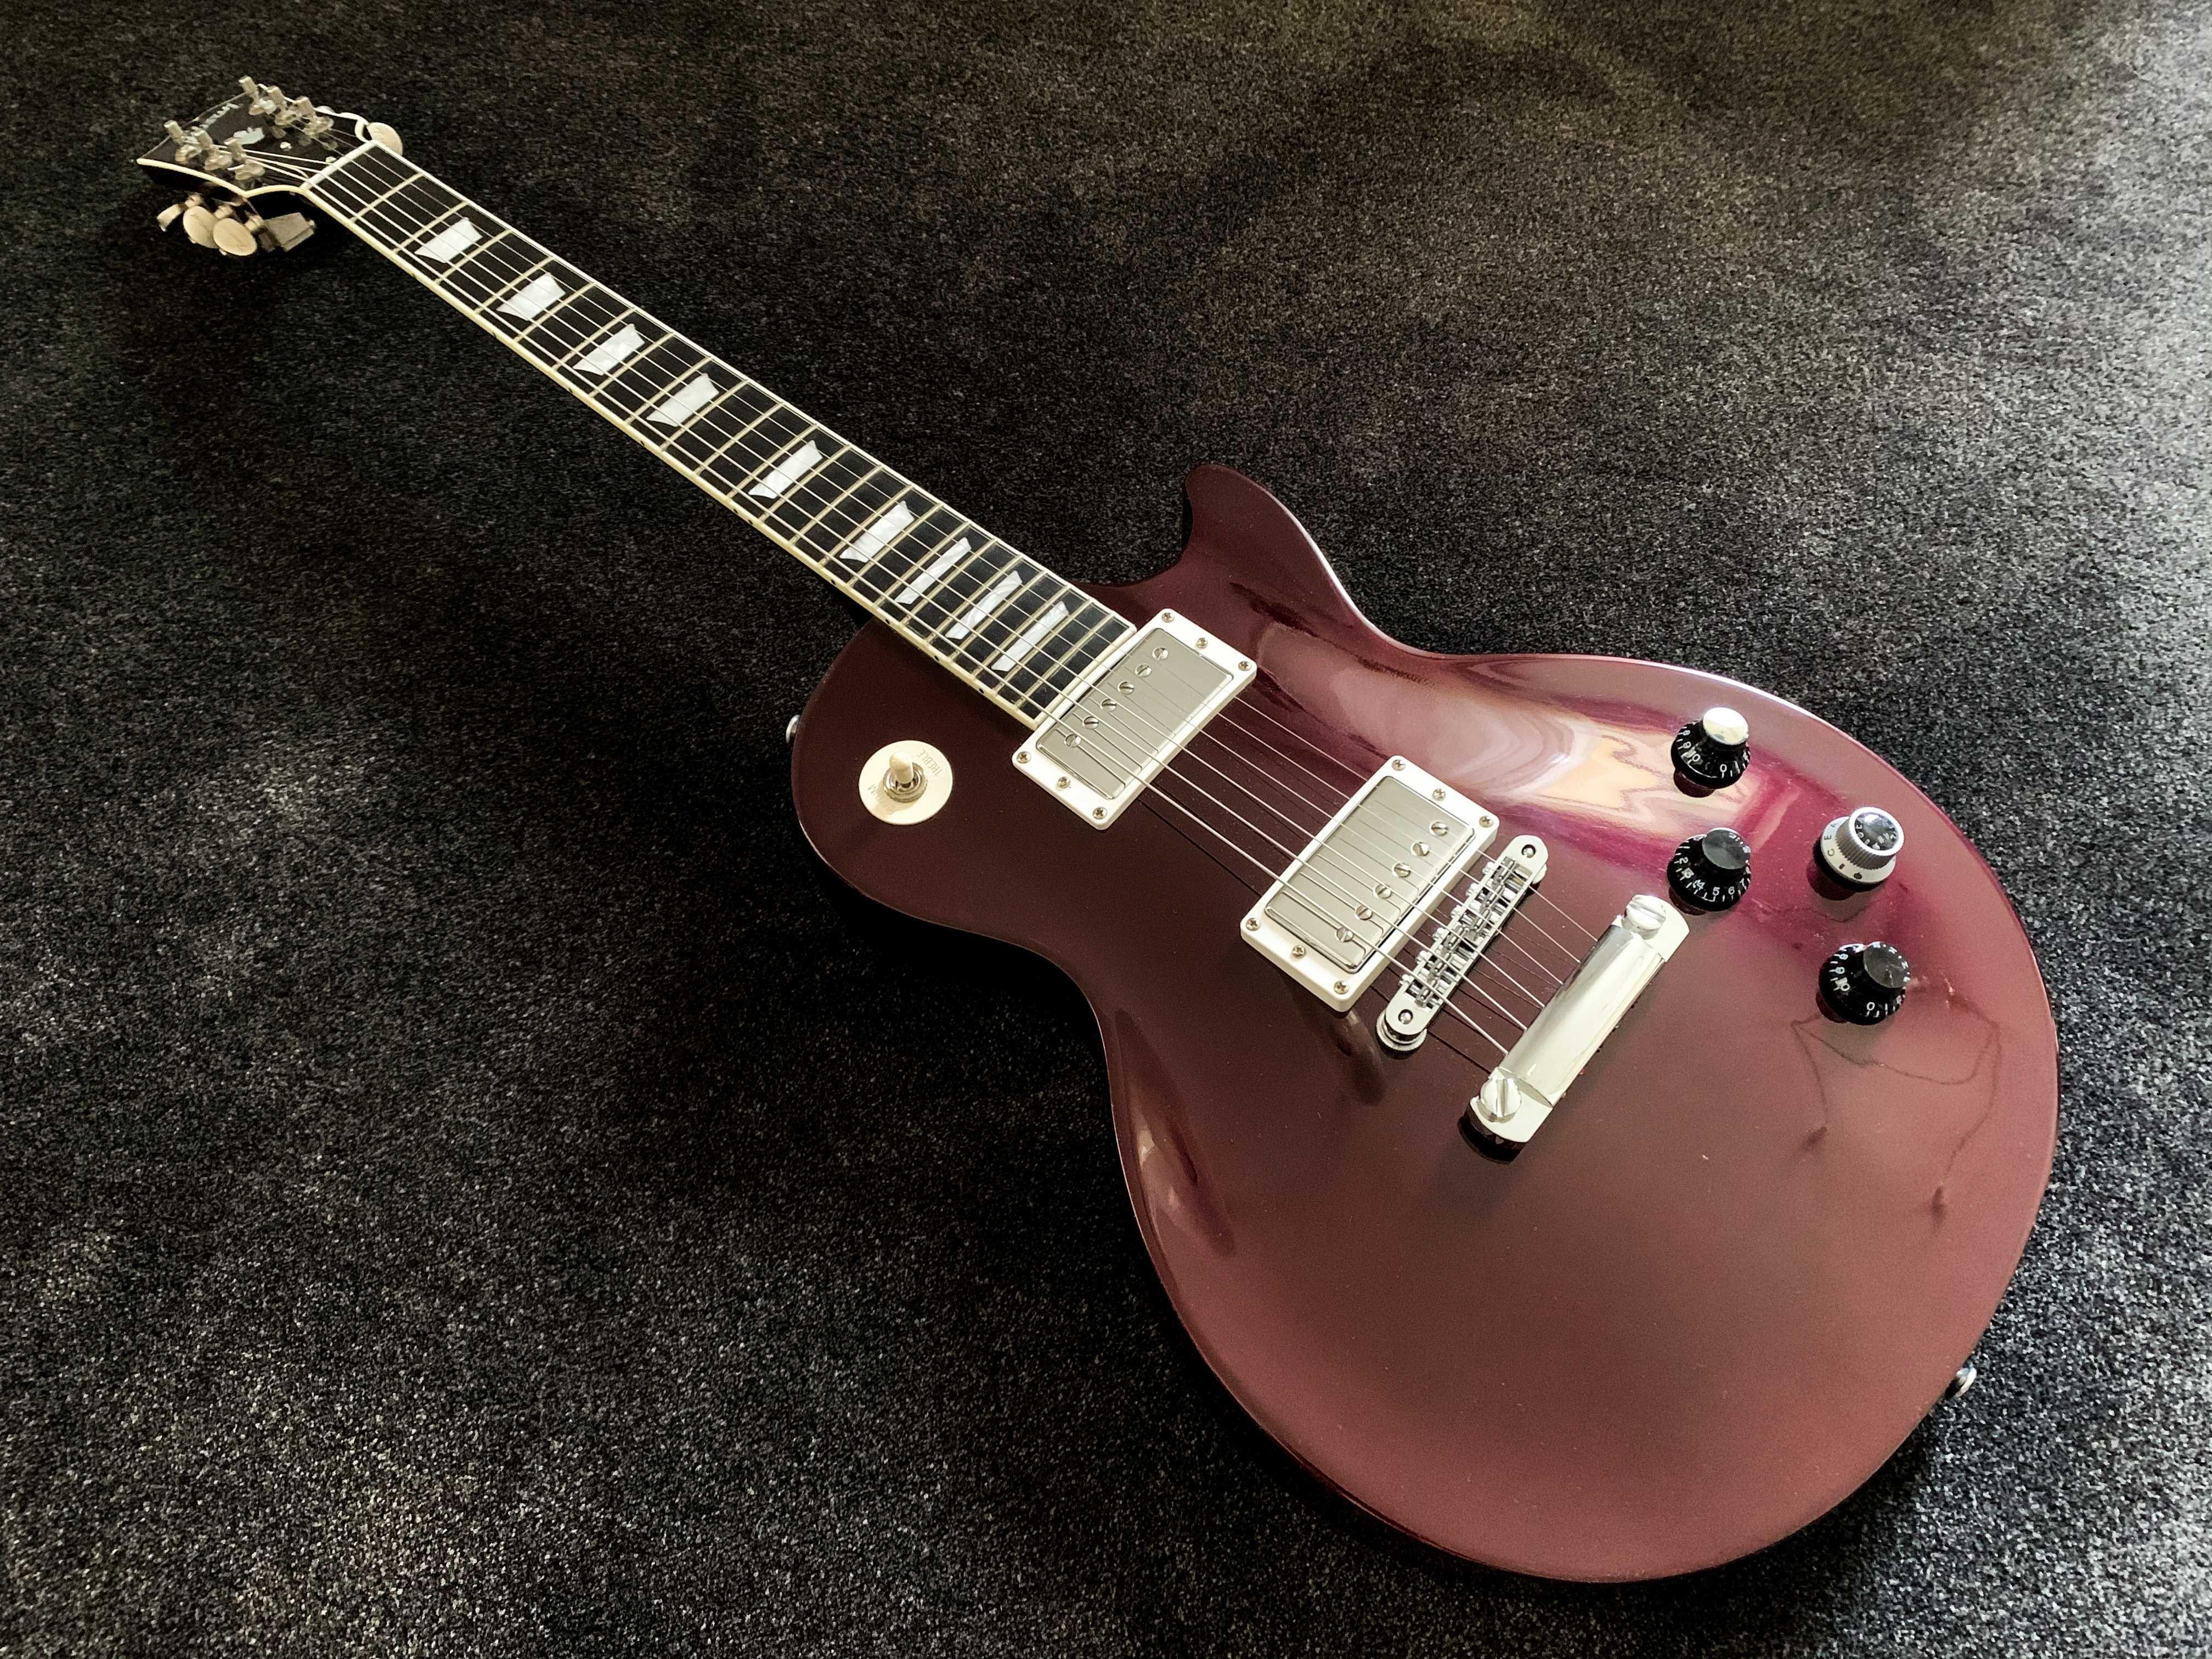 Gibson Les Paul Studio Limited Robot 2008 Purple Metallic